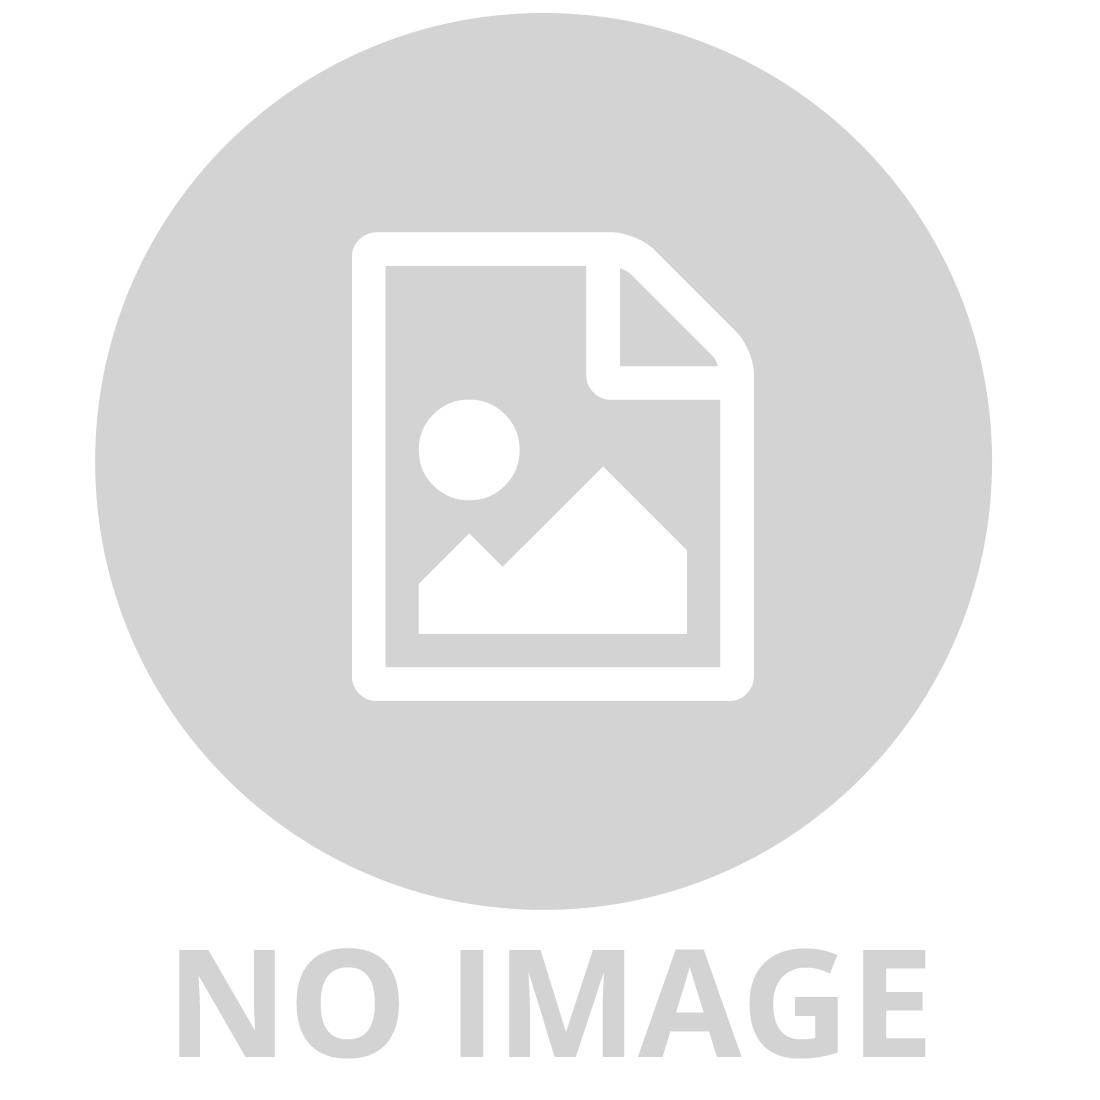 HUMBROL ENAMEL PAINT GLOSS BRUNSWICK GREEN #3